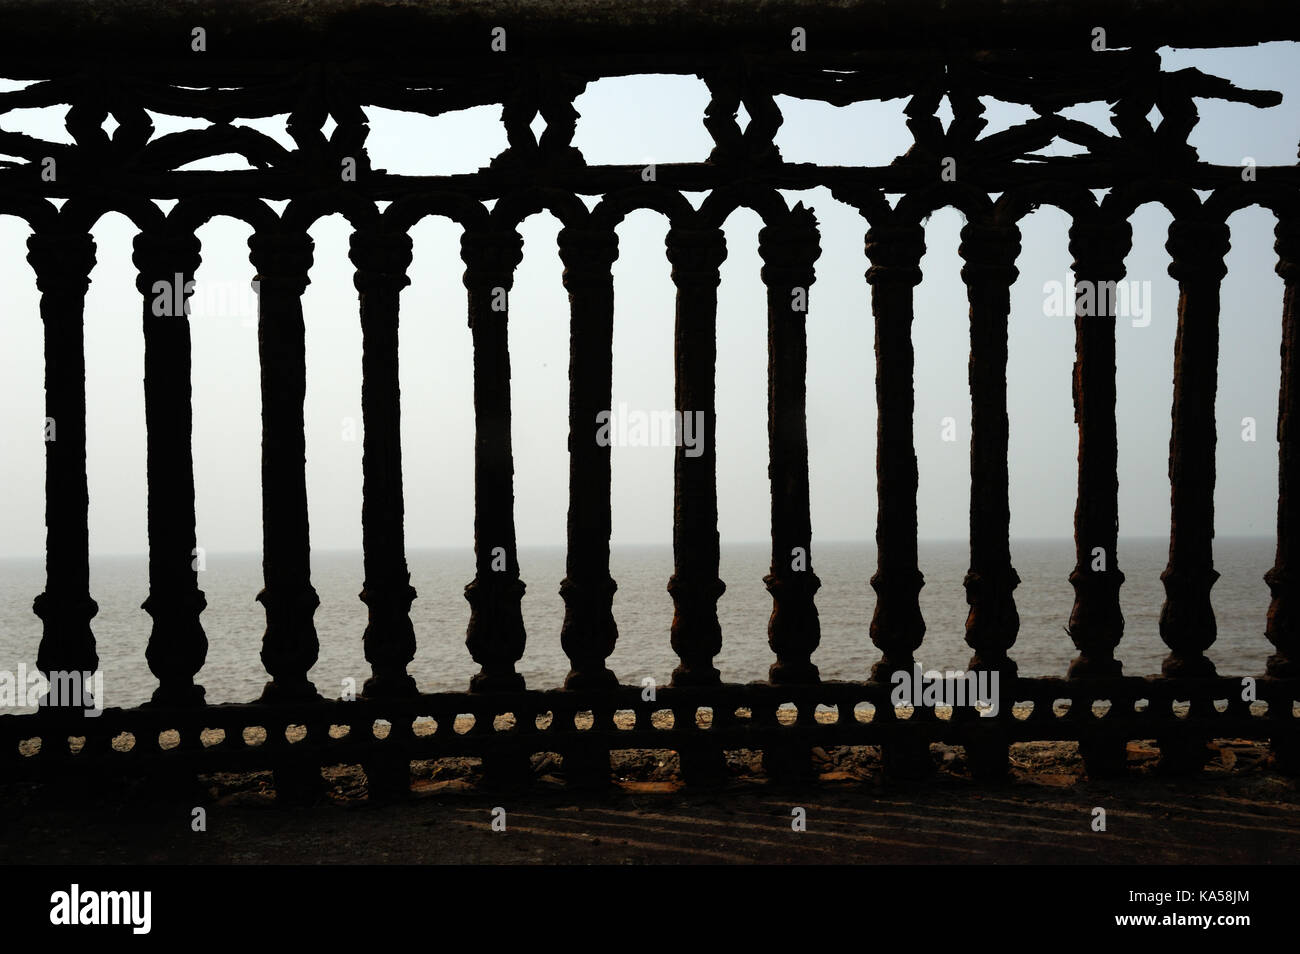 Rusted iron handrail Valsad gujarat , India, Asia - RMM 258772 - Stock Image